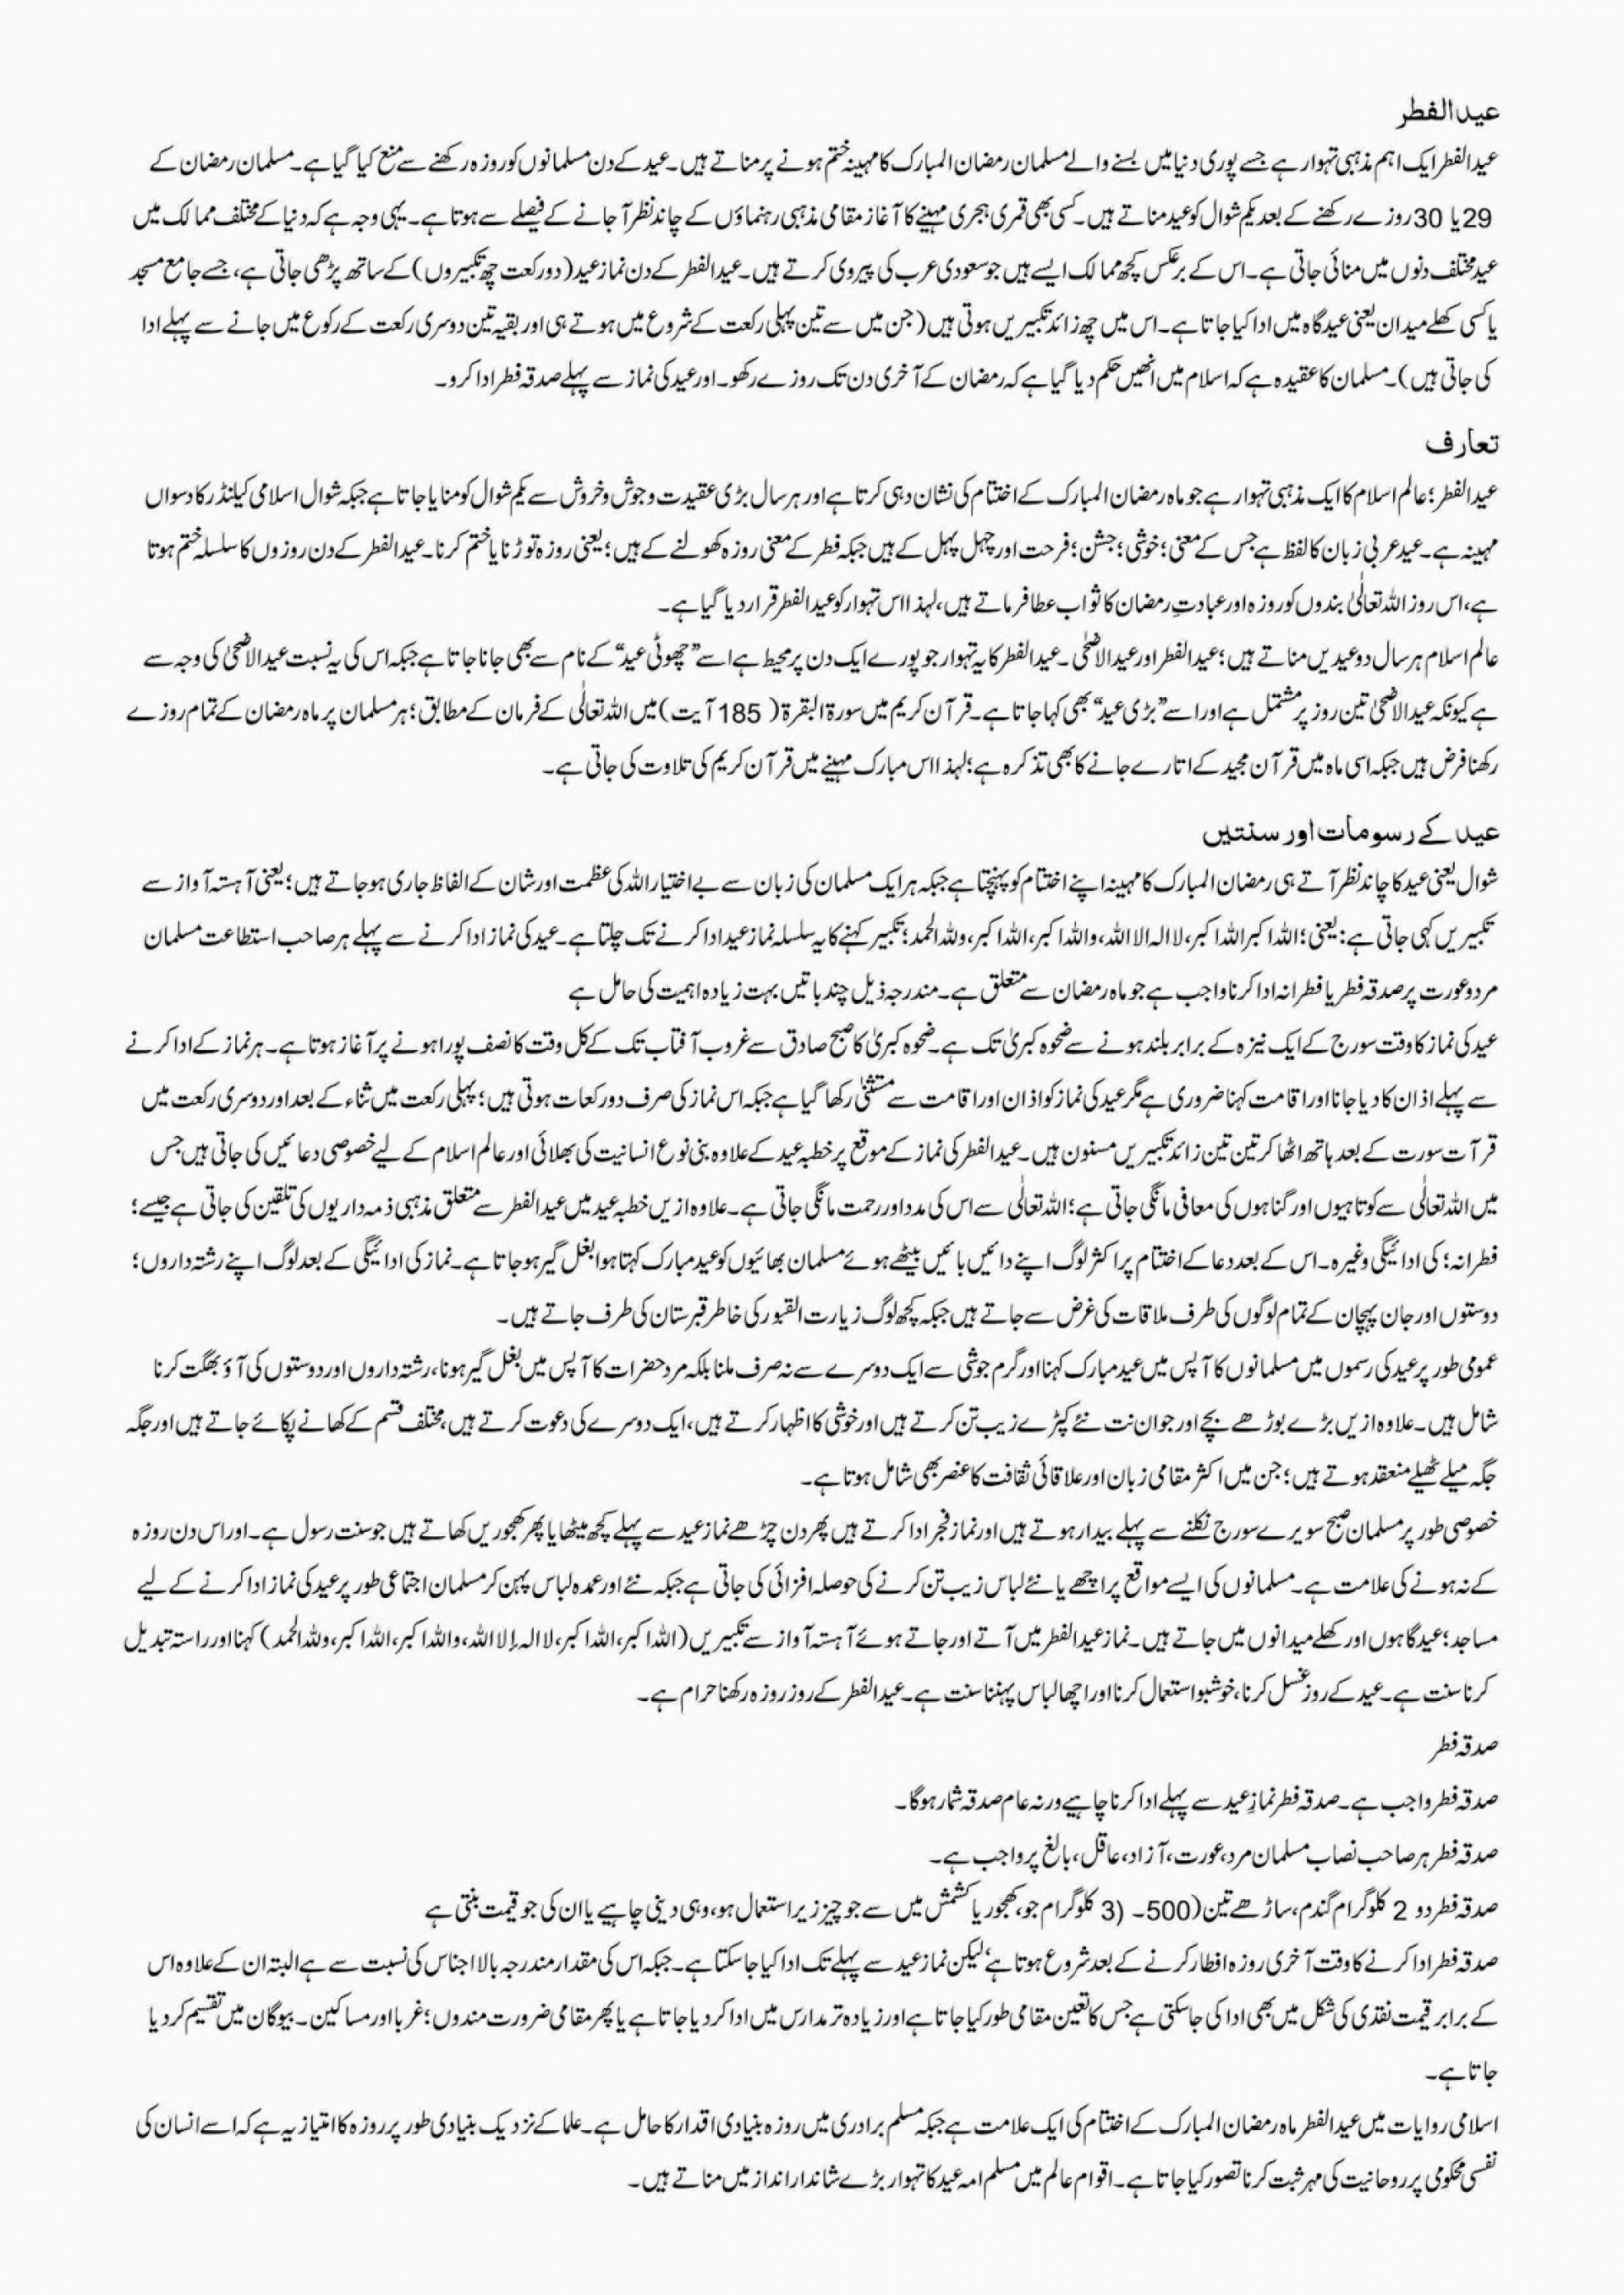 002 Essay Example Eid2bal2bfitar Mahatma Gandhi In Imposing Urdu Language Jayanti Speech 1920